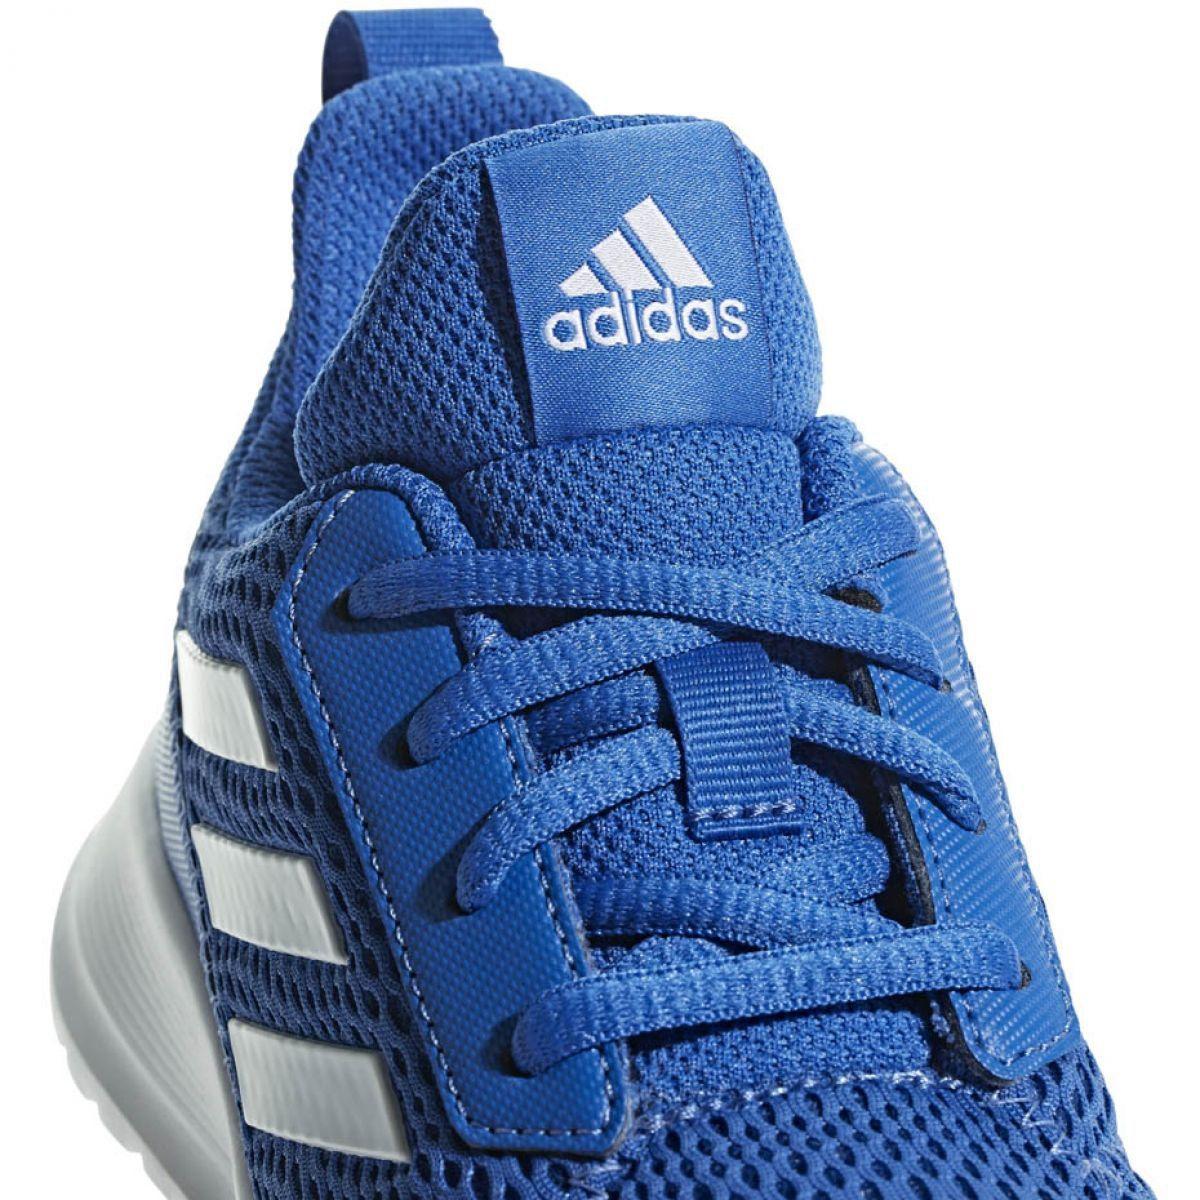 Buty Adidas Altarun K Jr Cm8564 Niebieskie Shoes Sports Shoes Adidas Blue Shoes